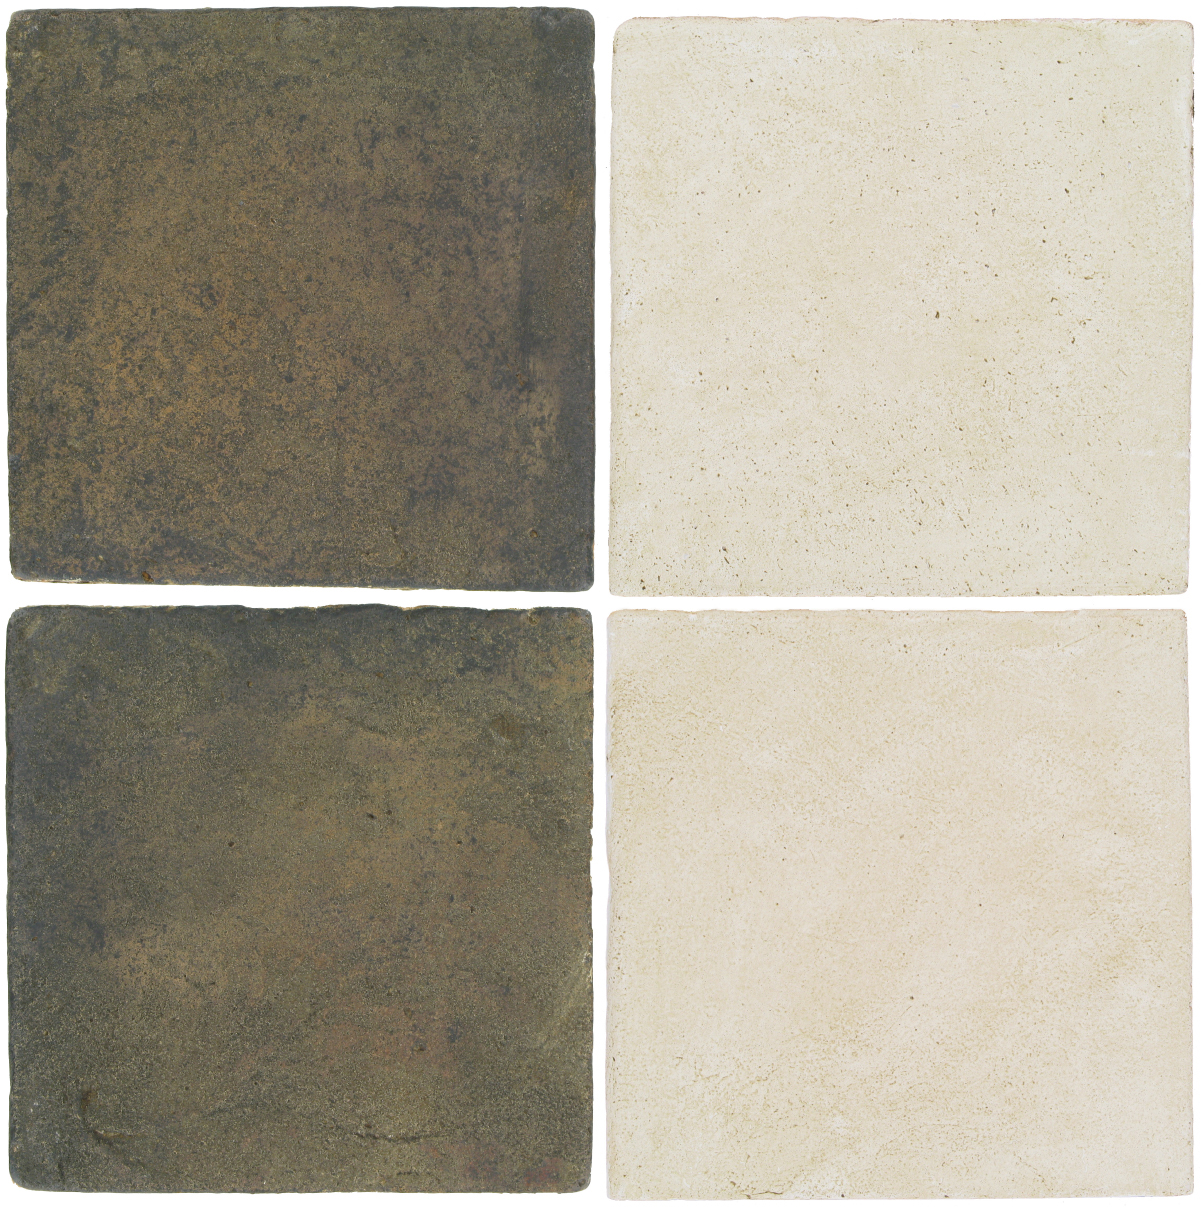 Pedralbes Antique Terracotta  2 Color Combinations  VTG-PSTG Terra Grey + OHS-PGAW Antique White